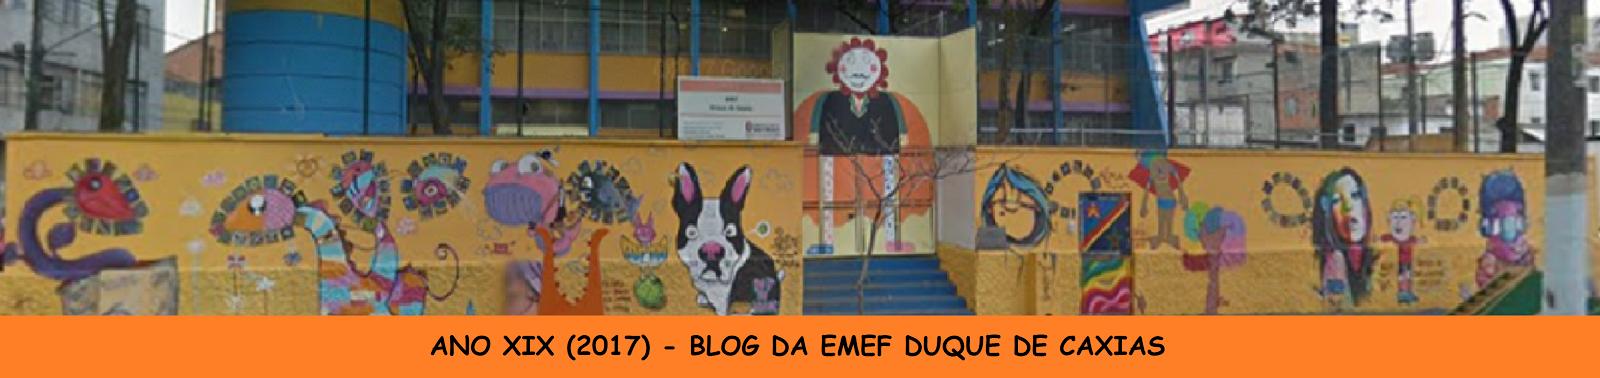 BLOG DA EMEF DUQUE DE CAXIAS